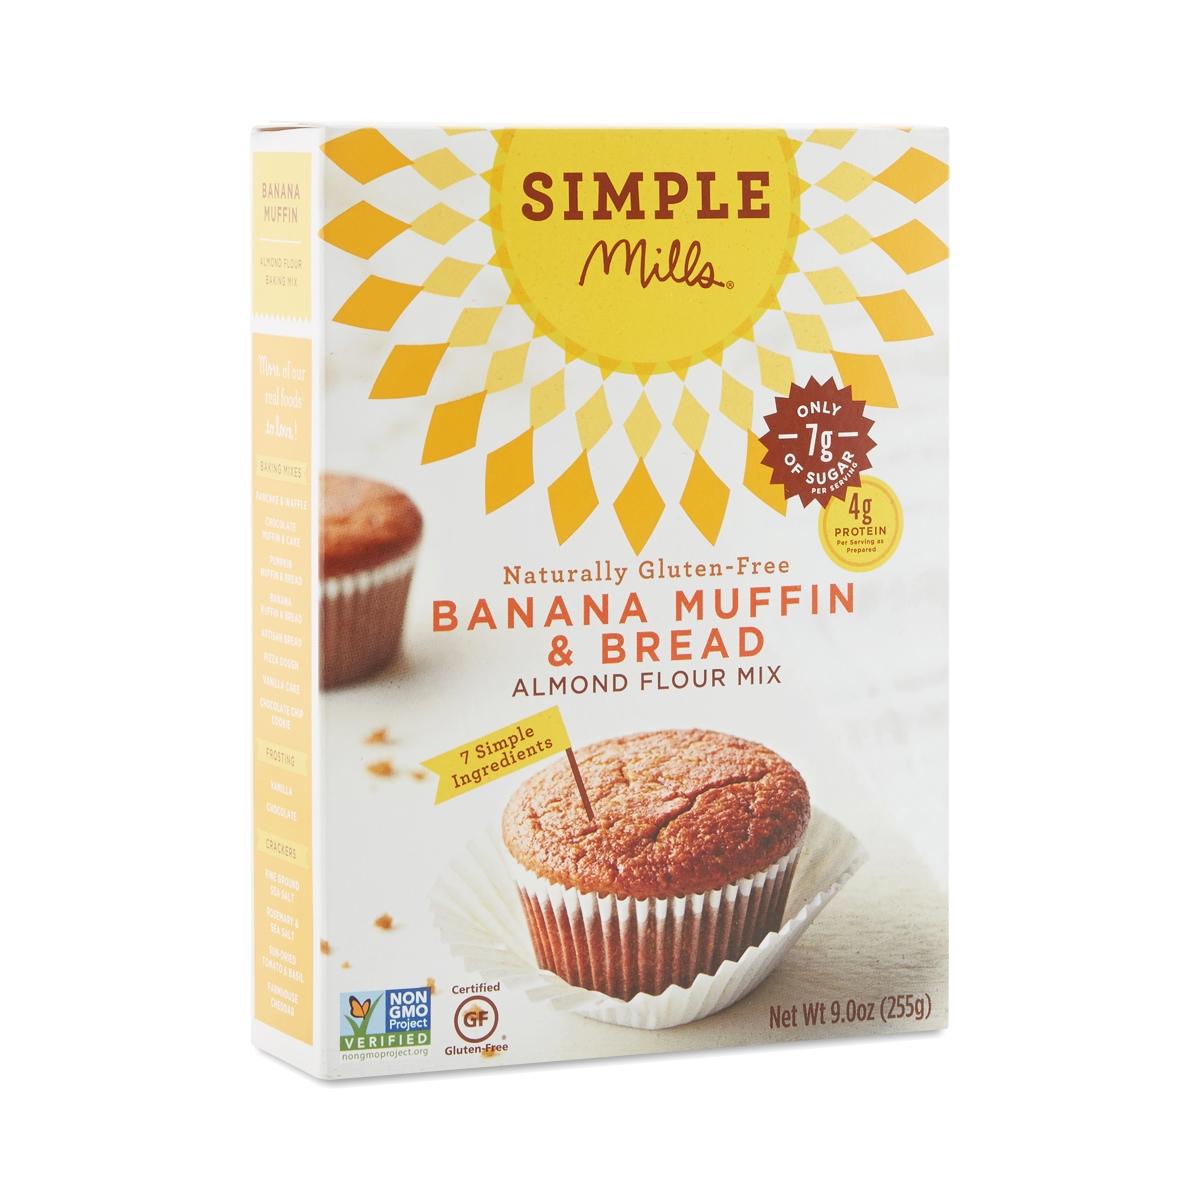 Simple Mills Banana Muffin & Bread Mix 9.4 oz box